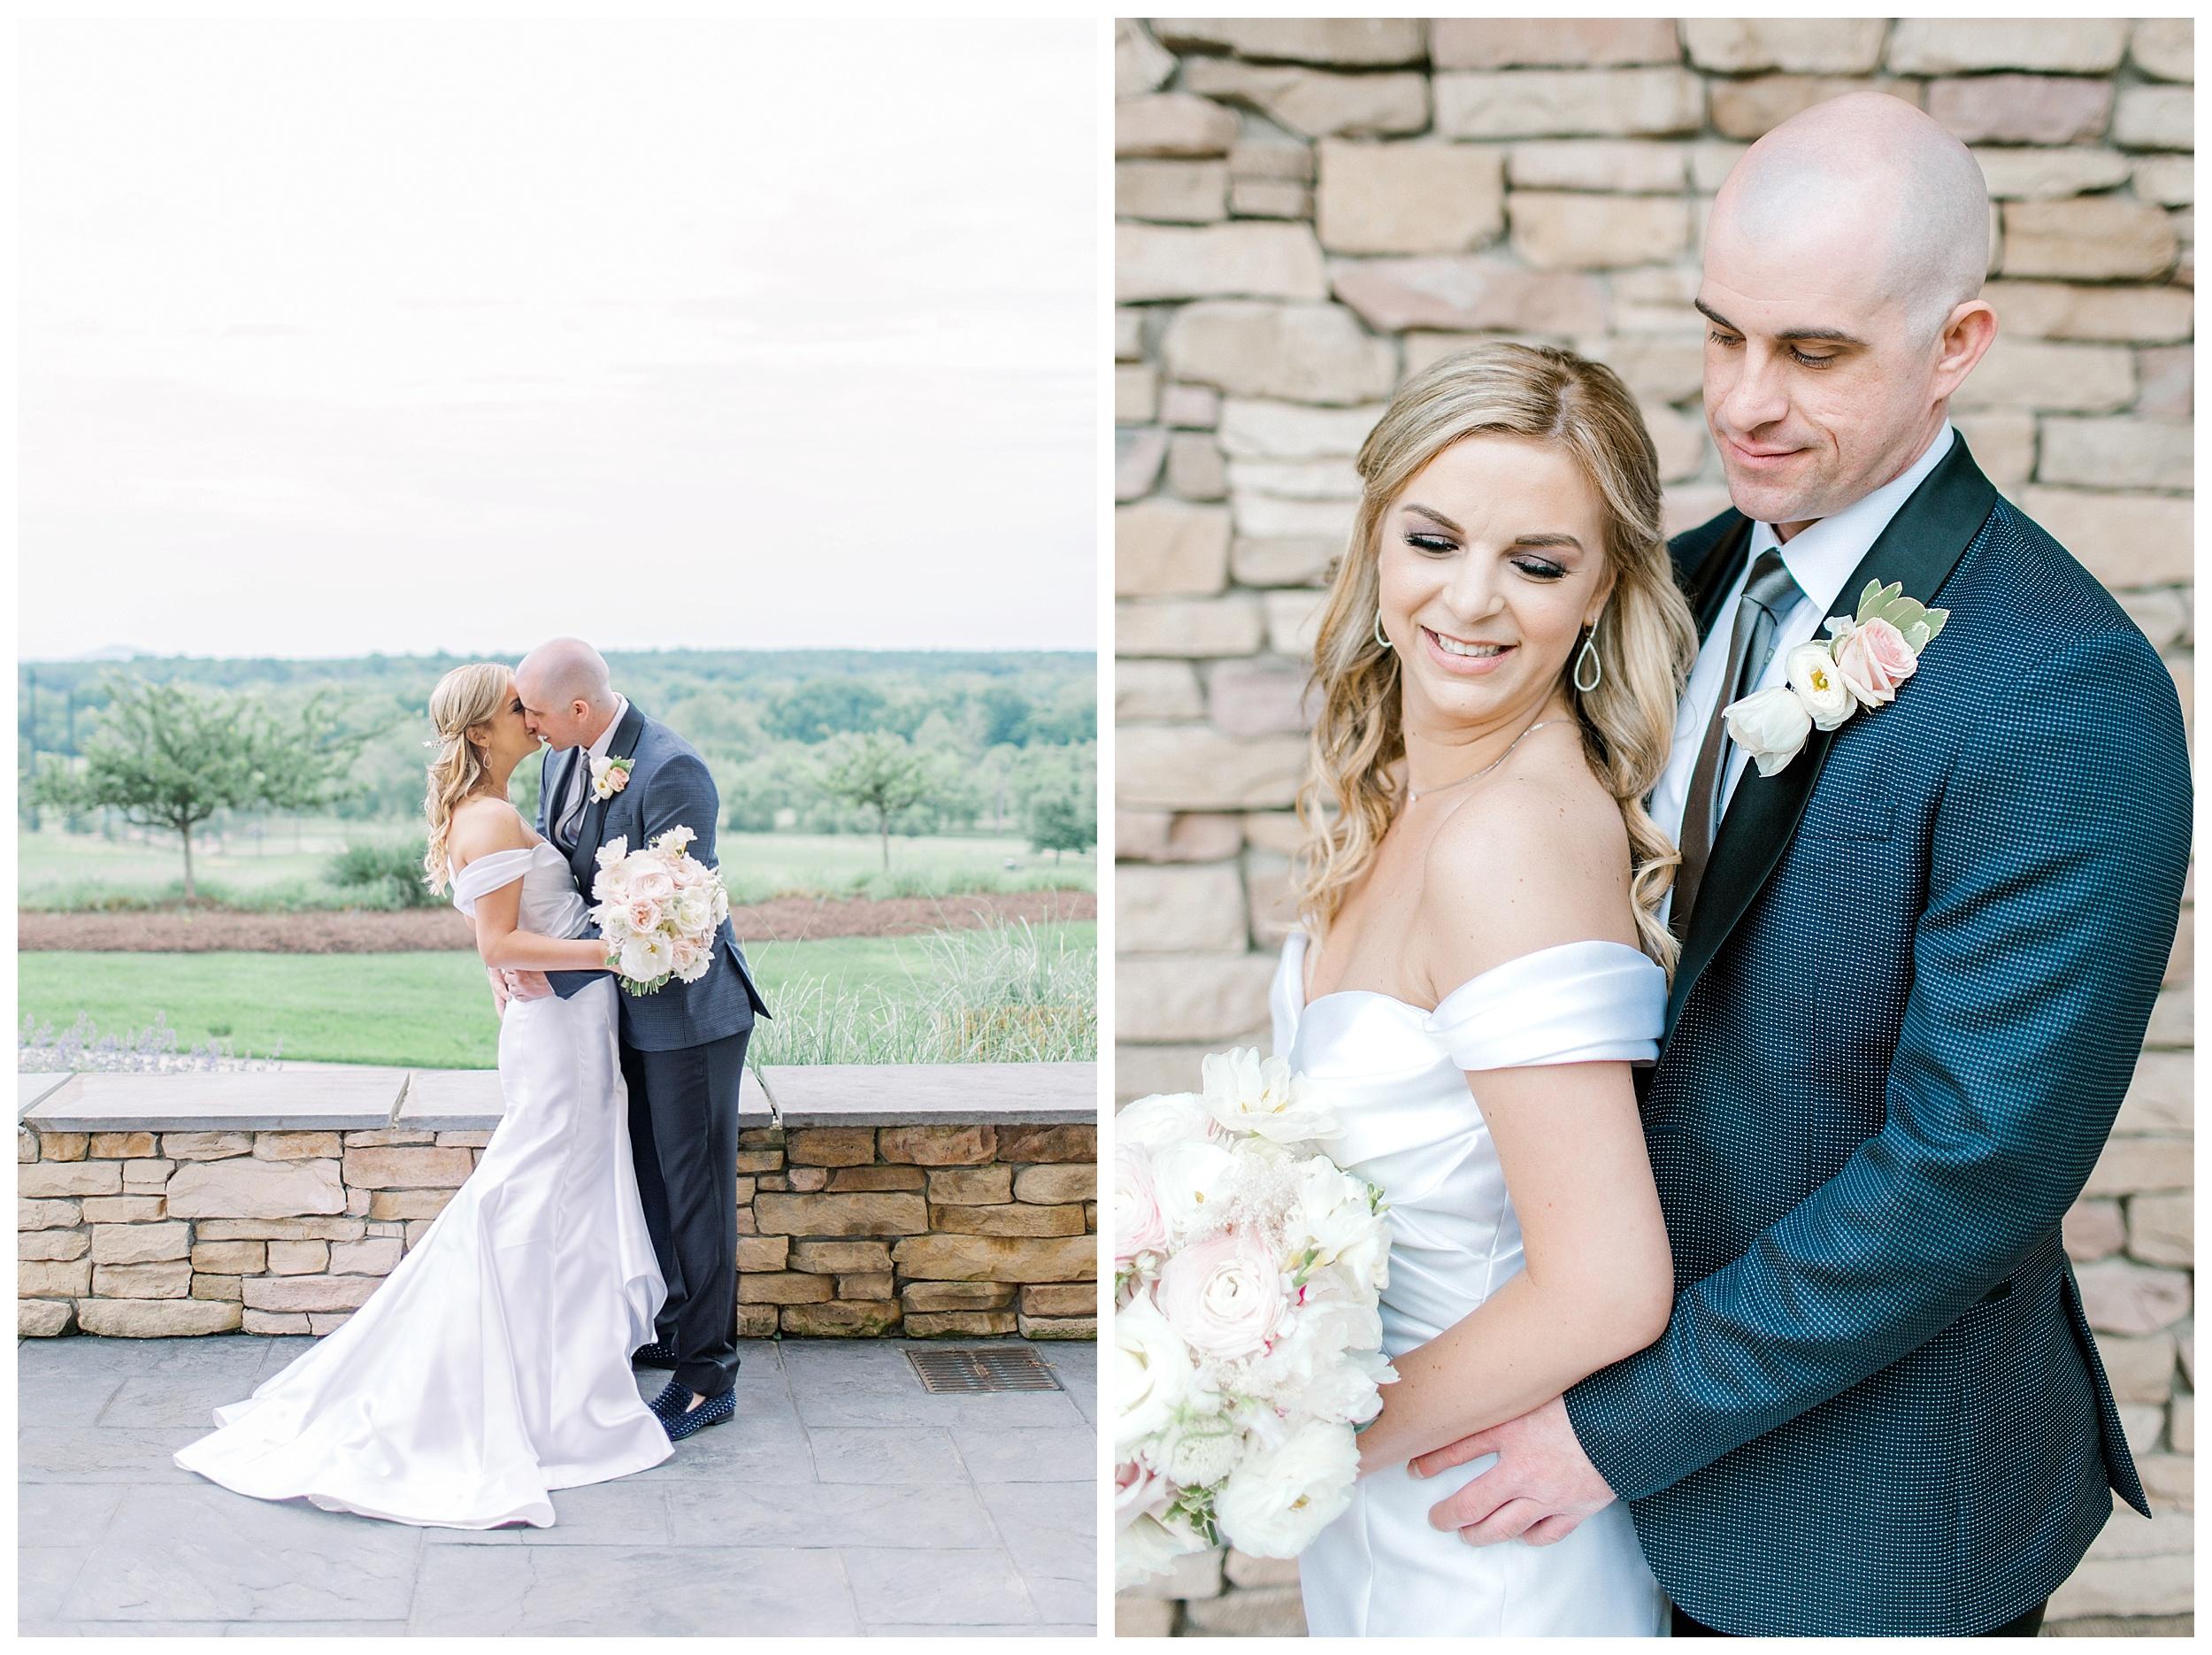 Lansdowne Resort Wedding | Virginia Film Wedding Photographer Kir Tuben_0046.jpg